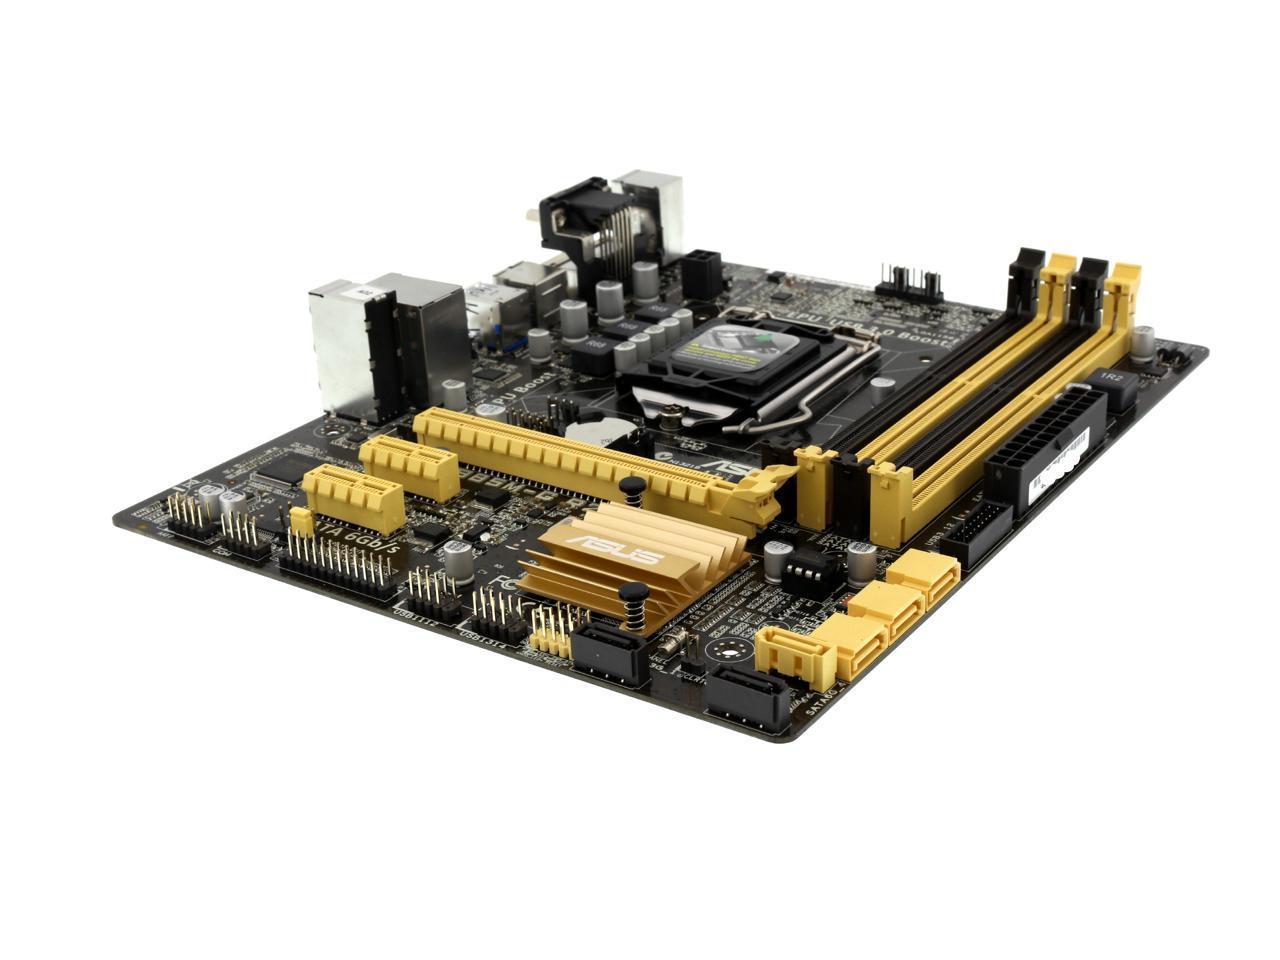 Used - Very Good: ASUS B85M-G R2.0 LGA 1150 Micro ATX Intel Motherboard - Newegg.com